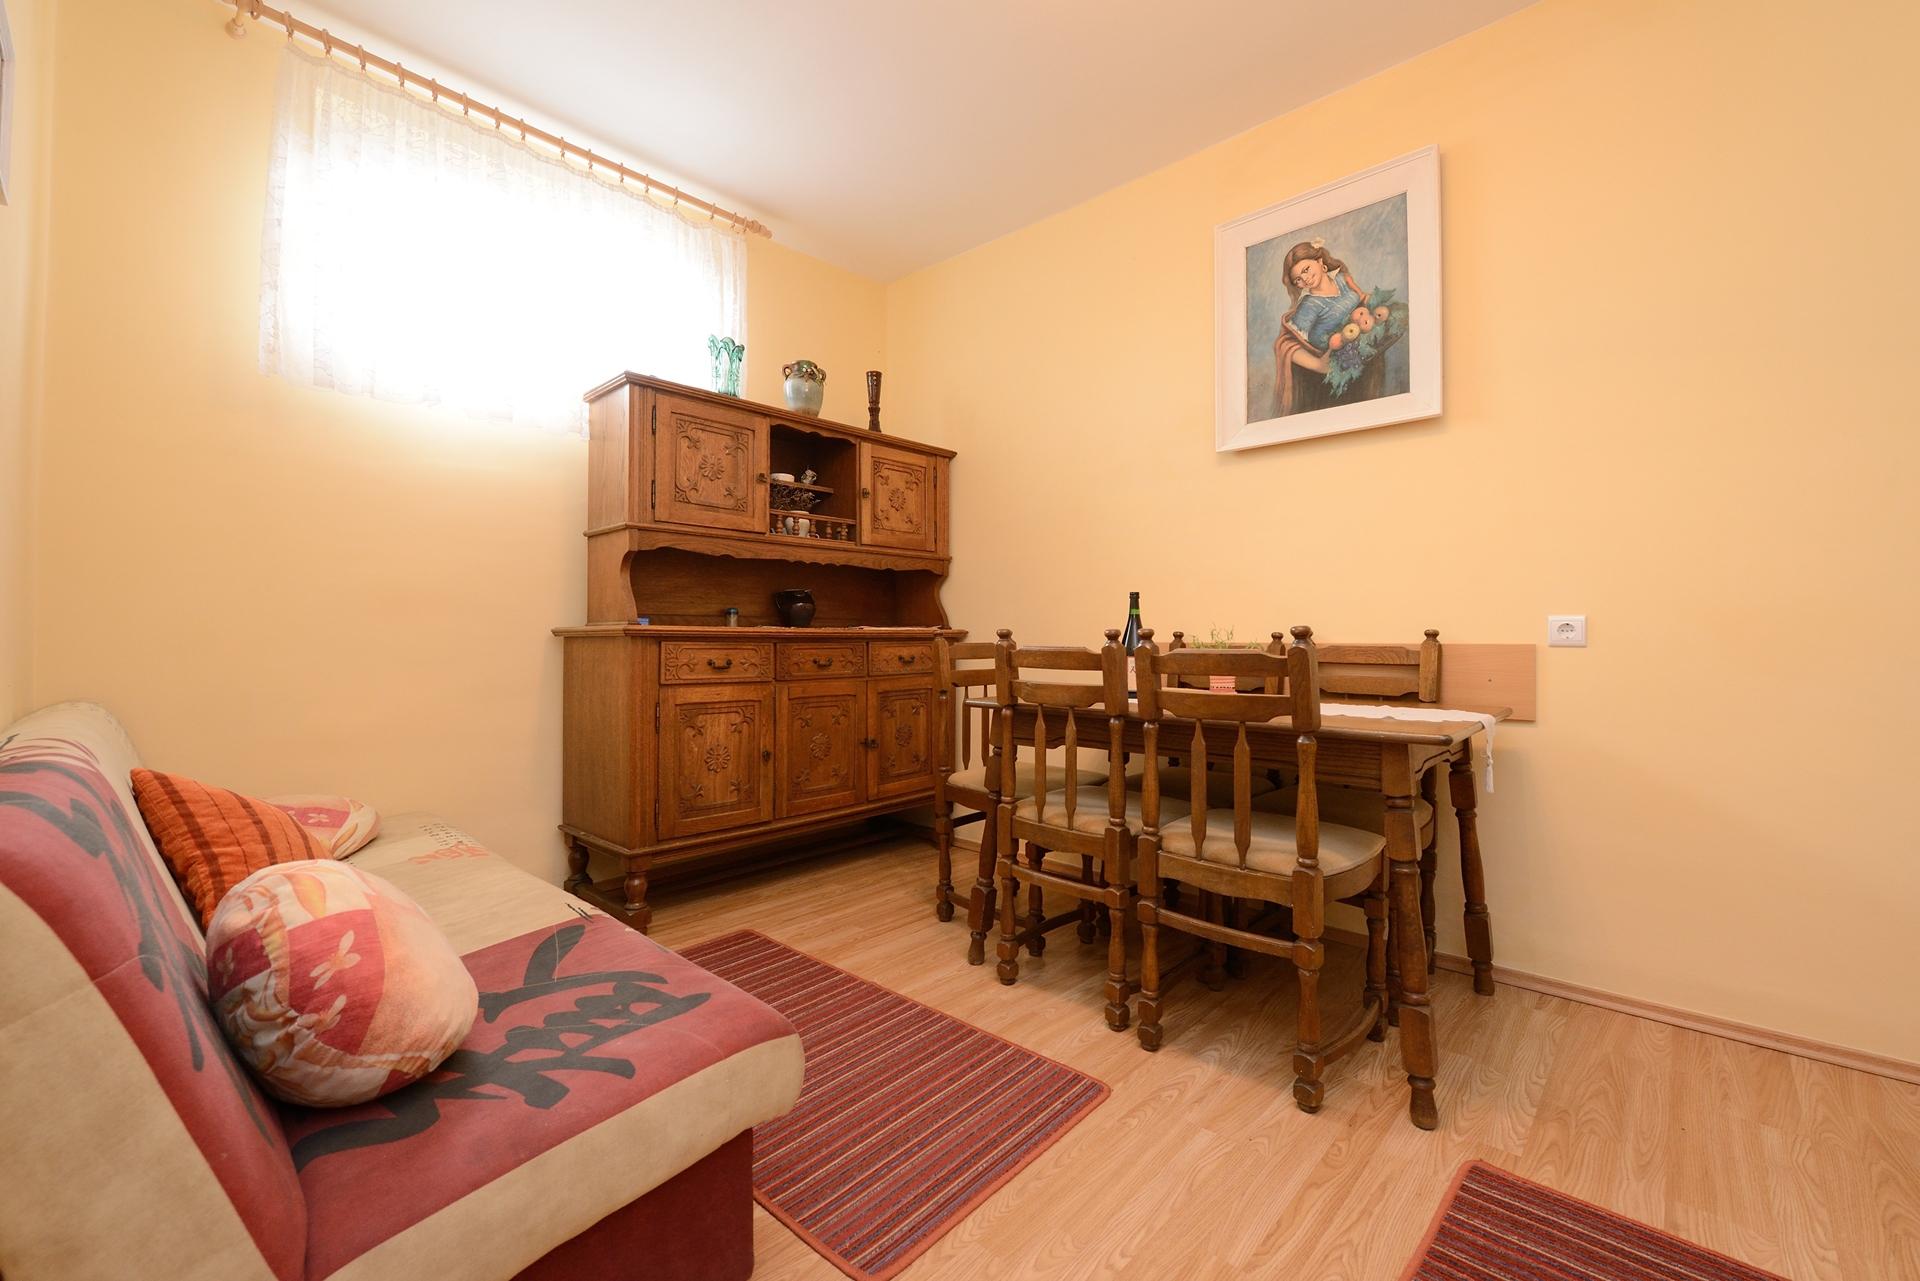 Martin - Lukoran - Vakantiehuizen, villa´s Kroatië - H(8): woonkamer